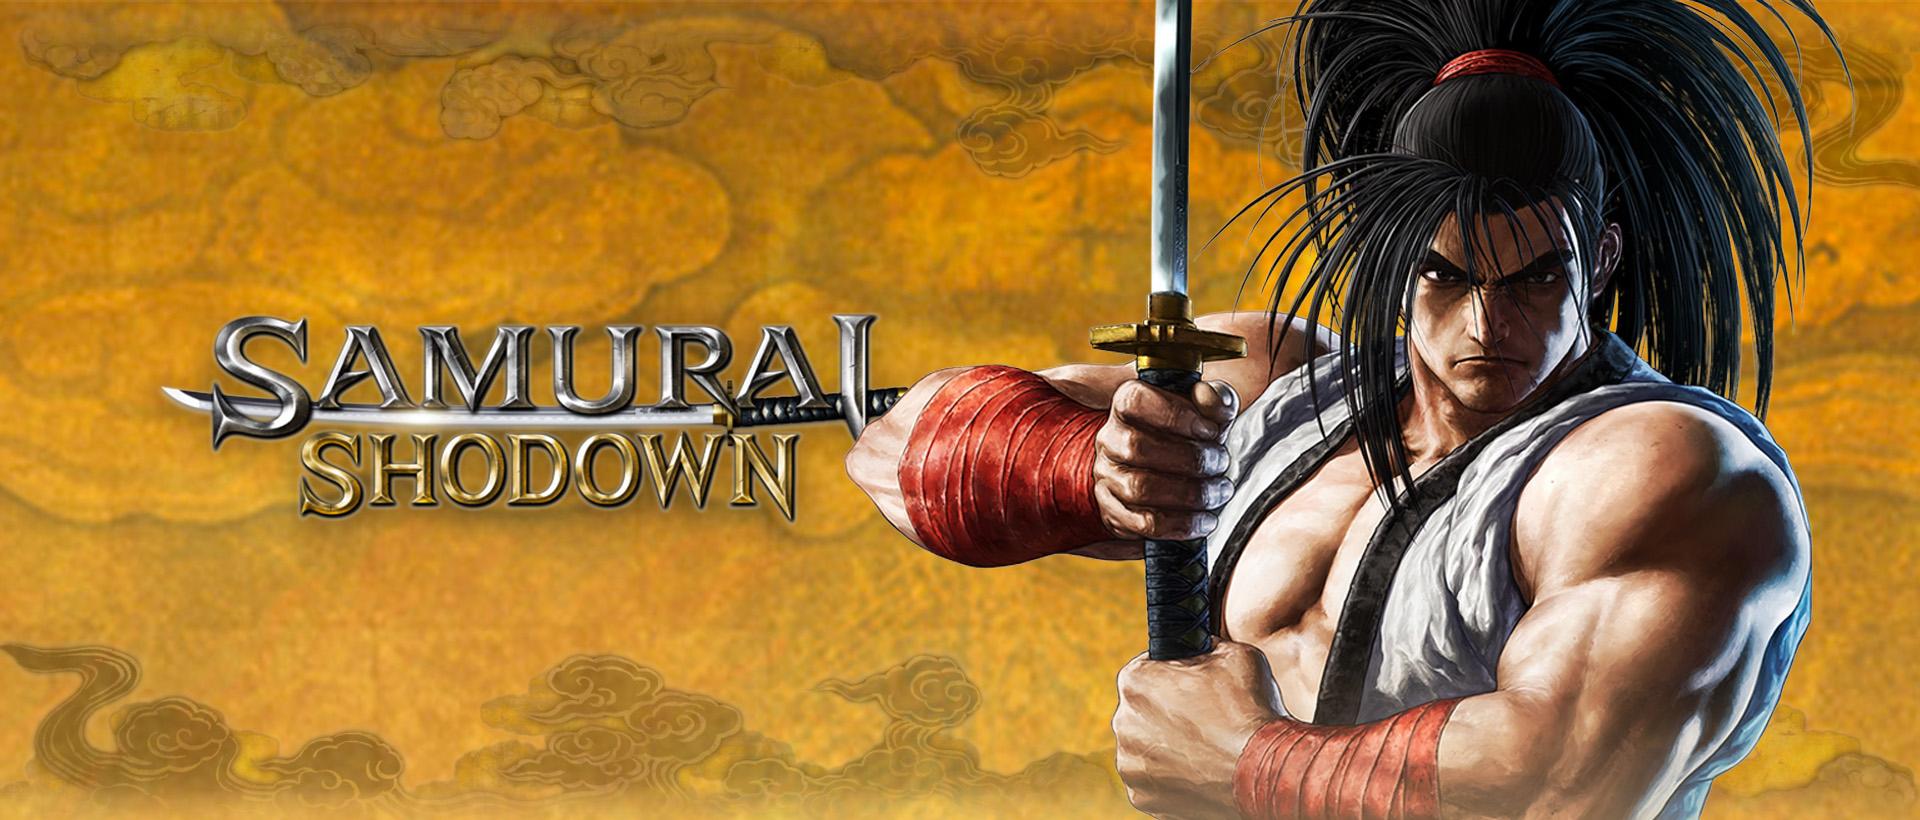 SAMURAI SHODOWN: Huyền Thoại Samurai